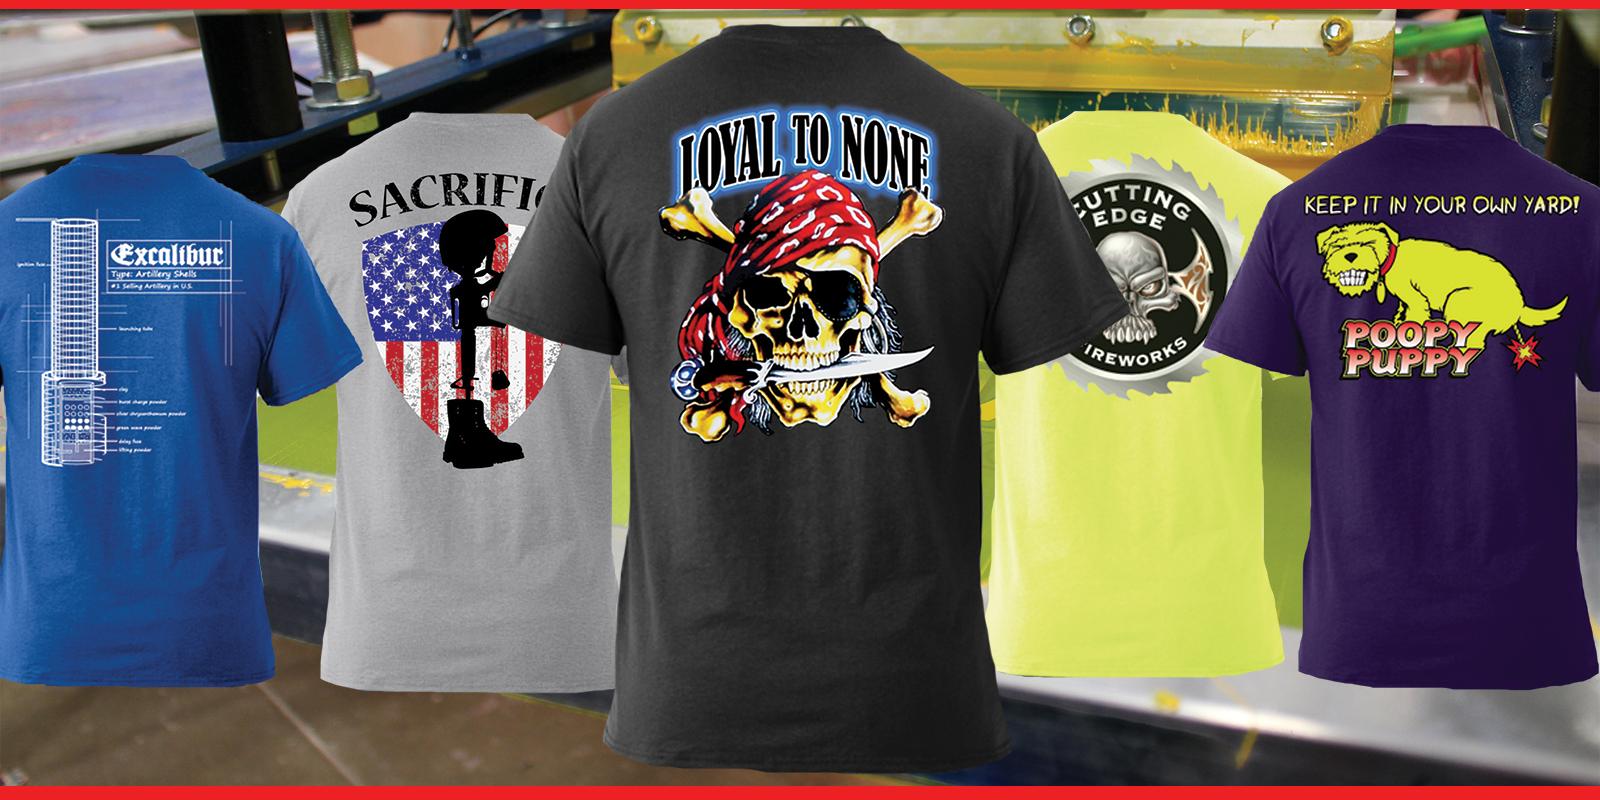 40% Off Patriotic & Firework T-Shirts